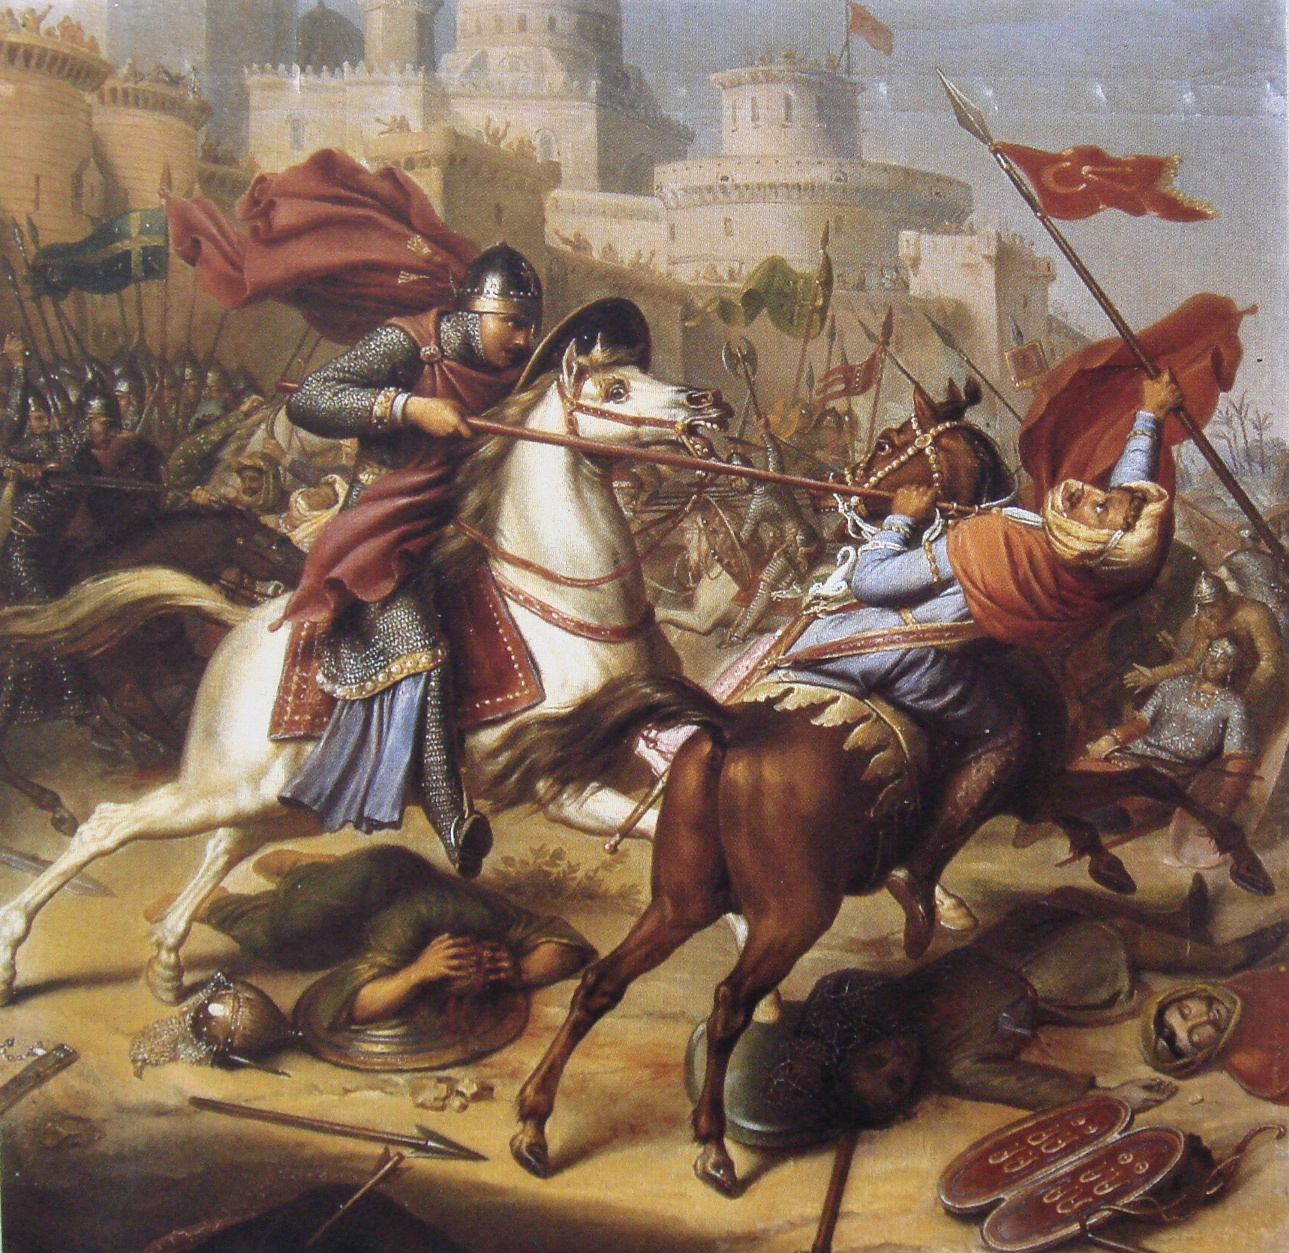 Depiction of Primera Cruzada